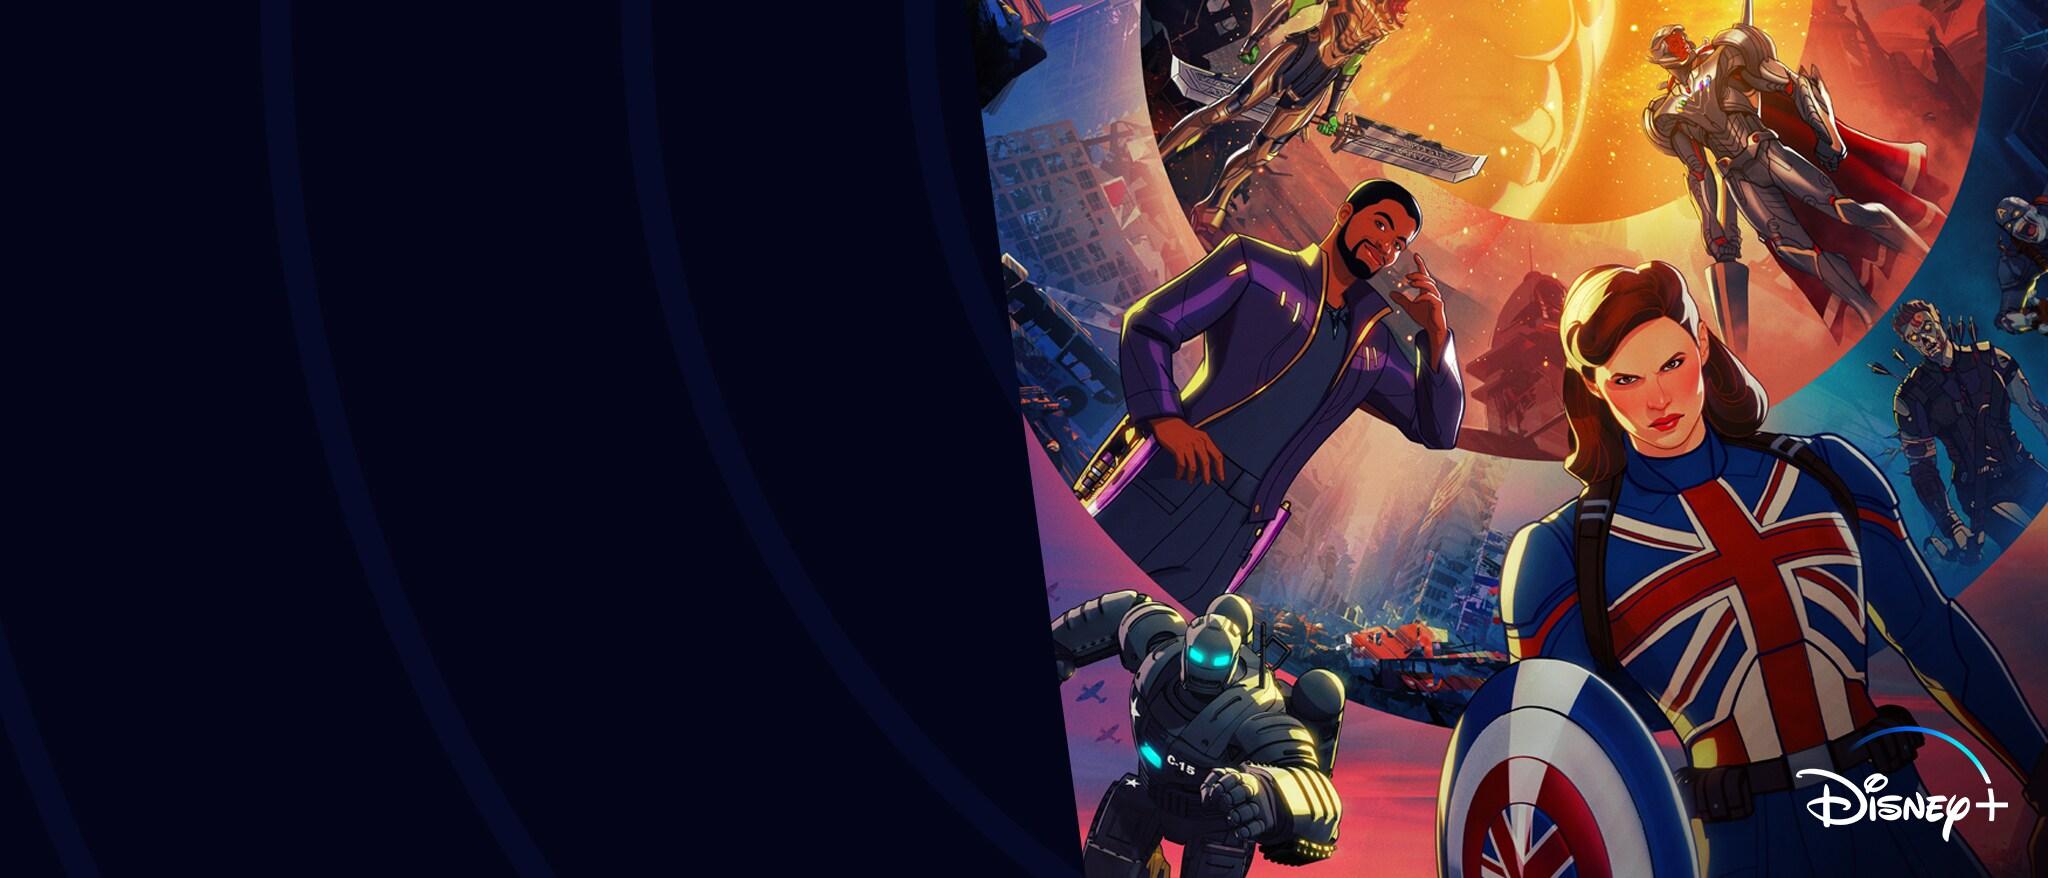 Hero - Disney+ - Marvel Studios' What If…? Now Streaming